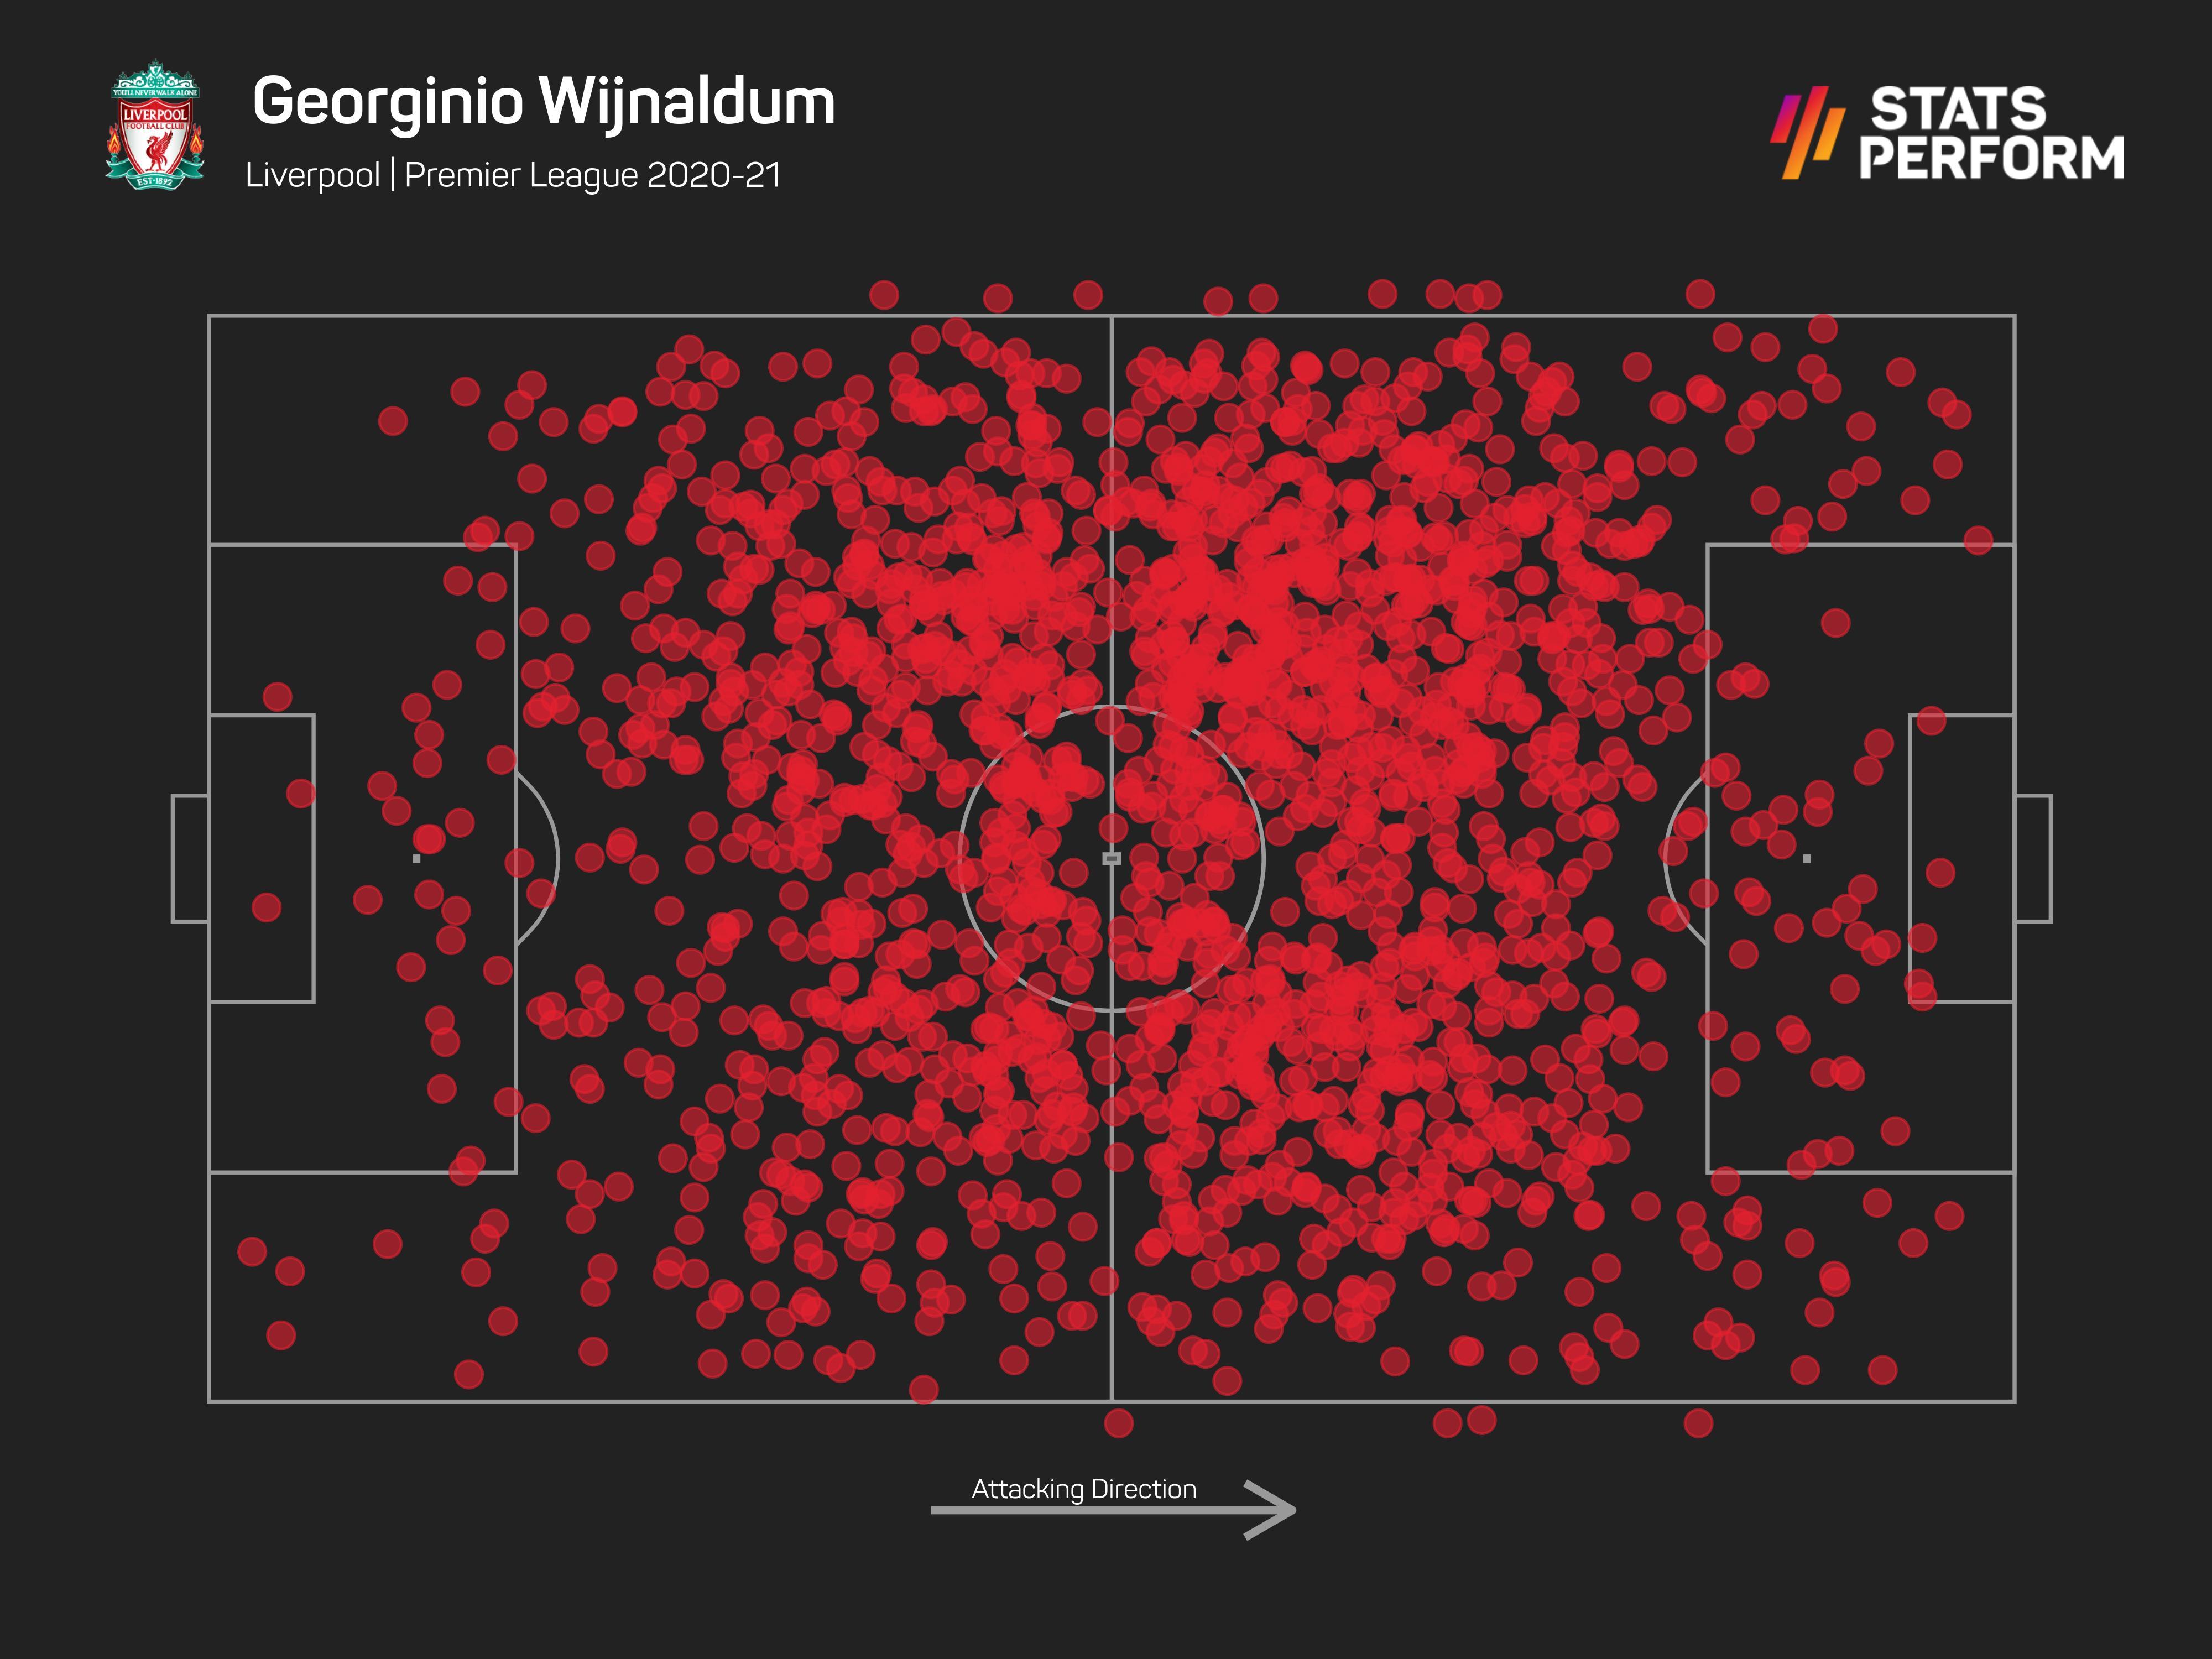 Georginio Wijnaldum's final Premier League season at Liverpool